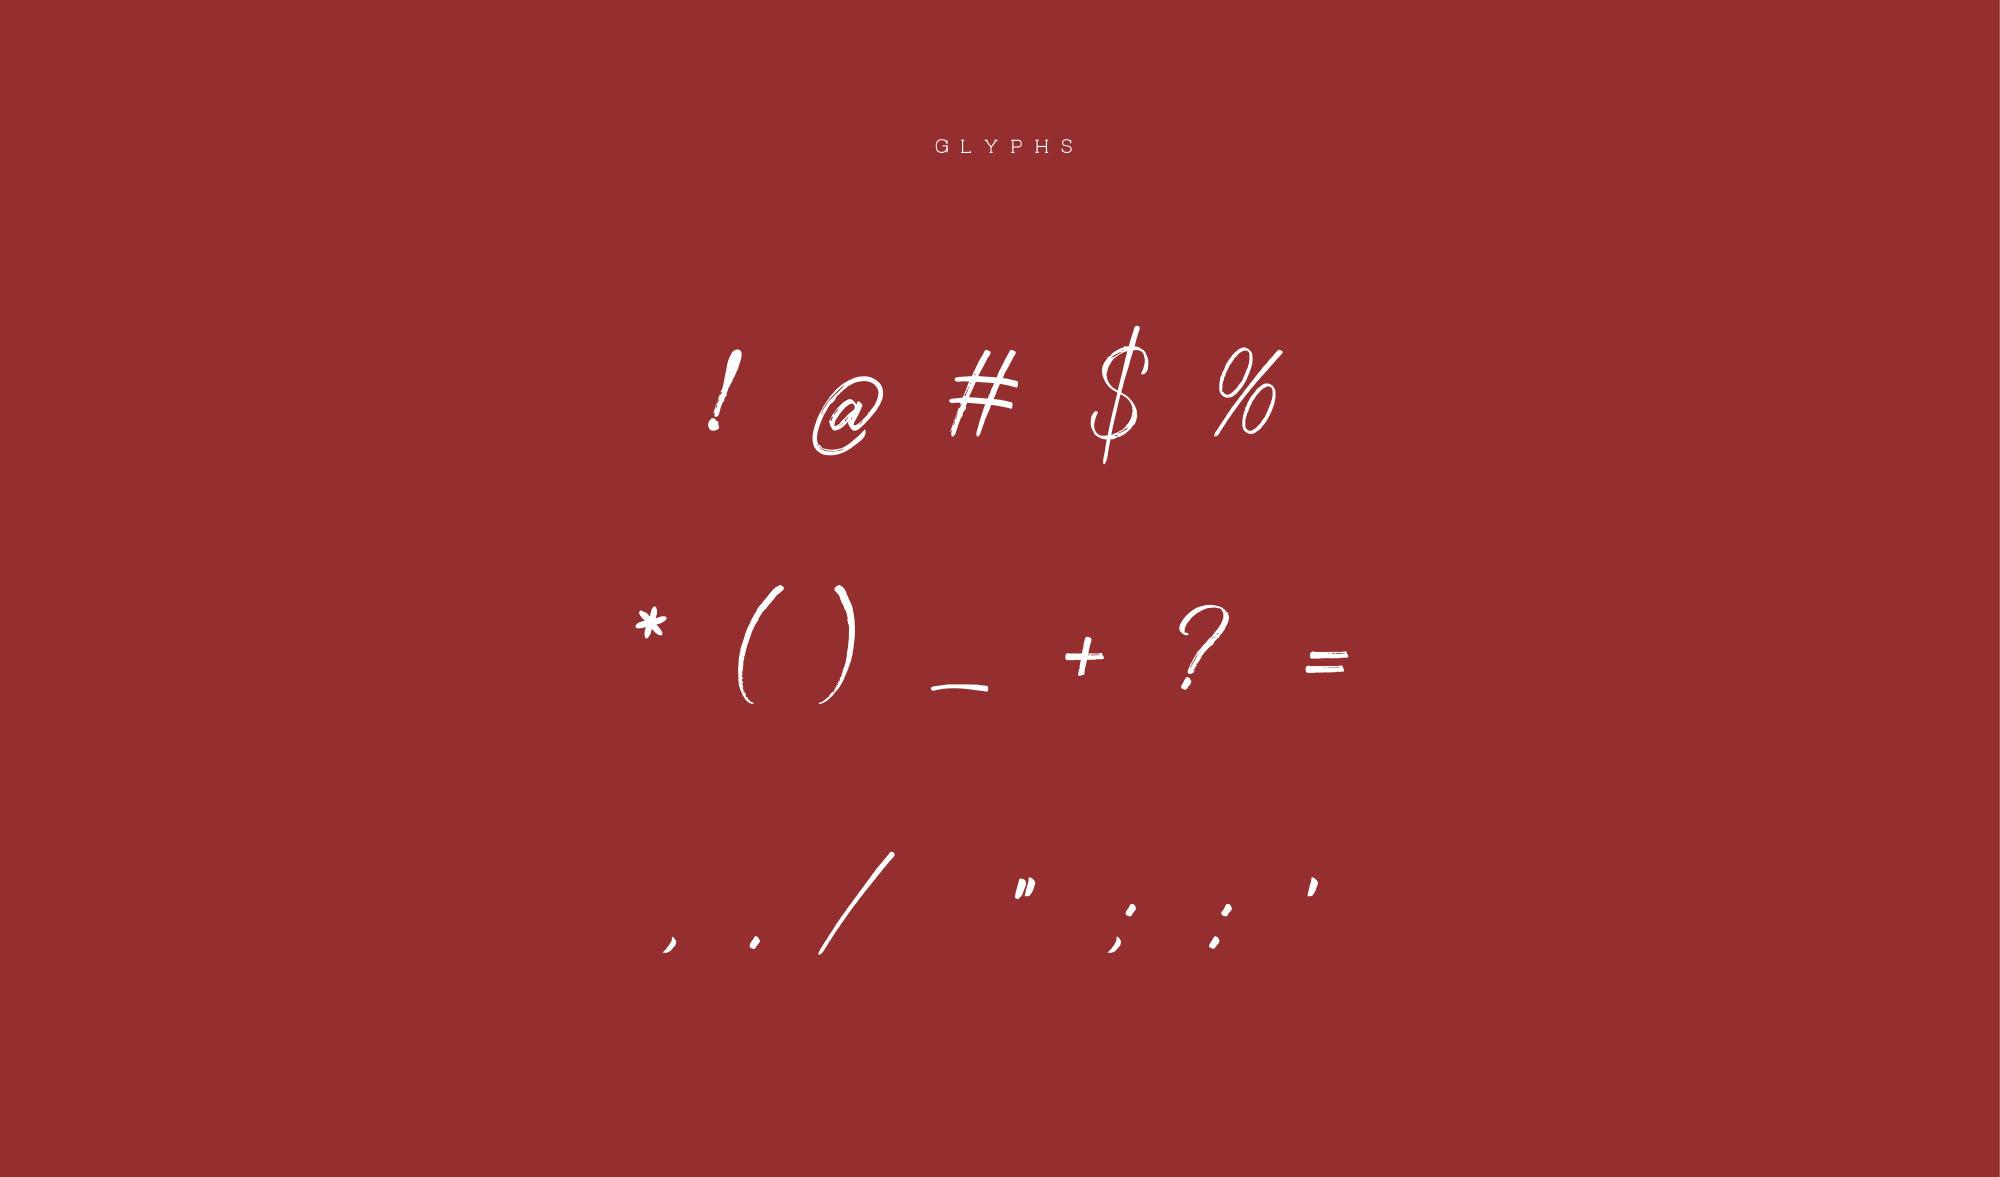 Strain Typeface - Glyphs